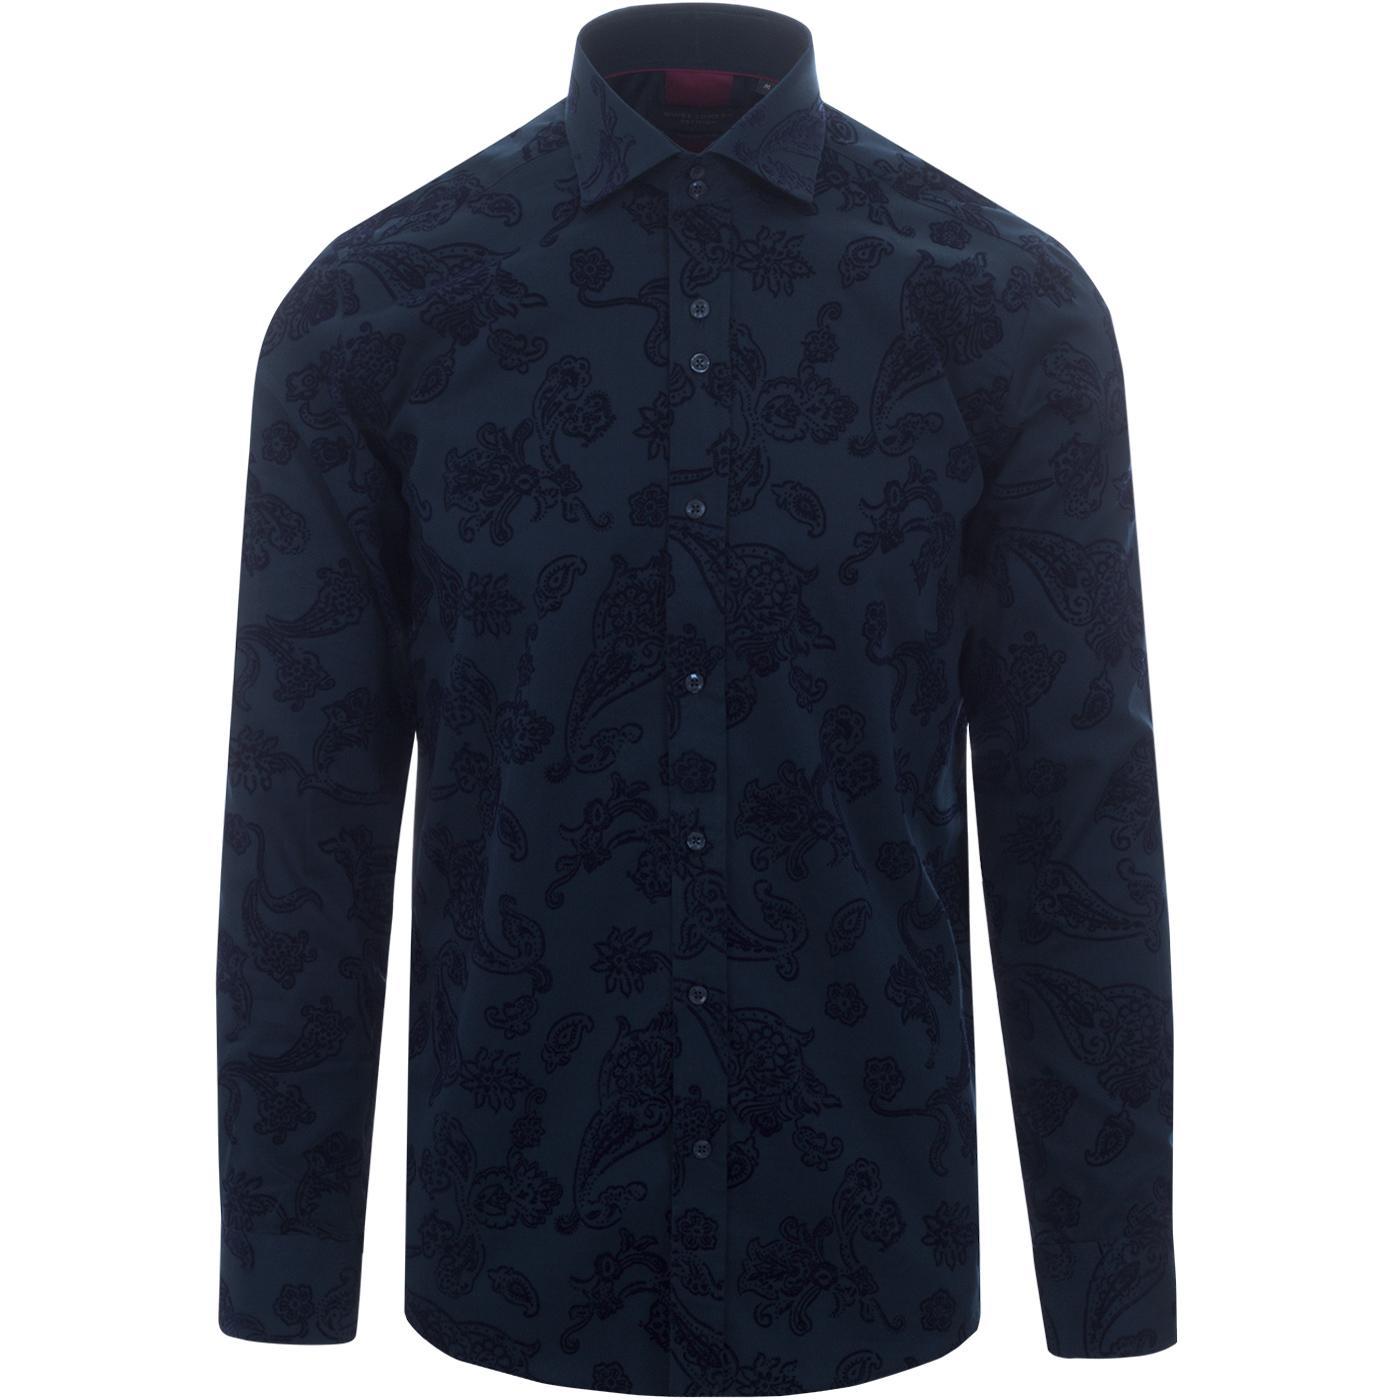 GUIDE LONDON Mod Baroque Paisley Flock Shirt (N)